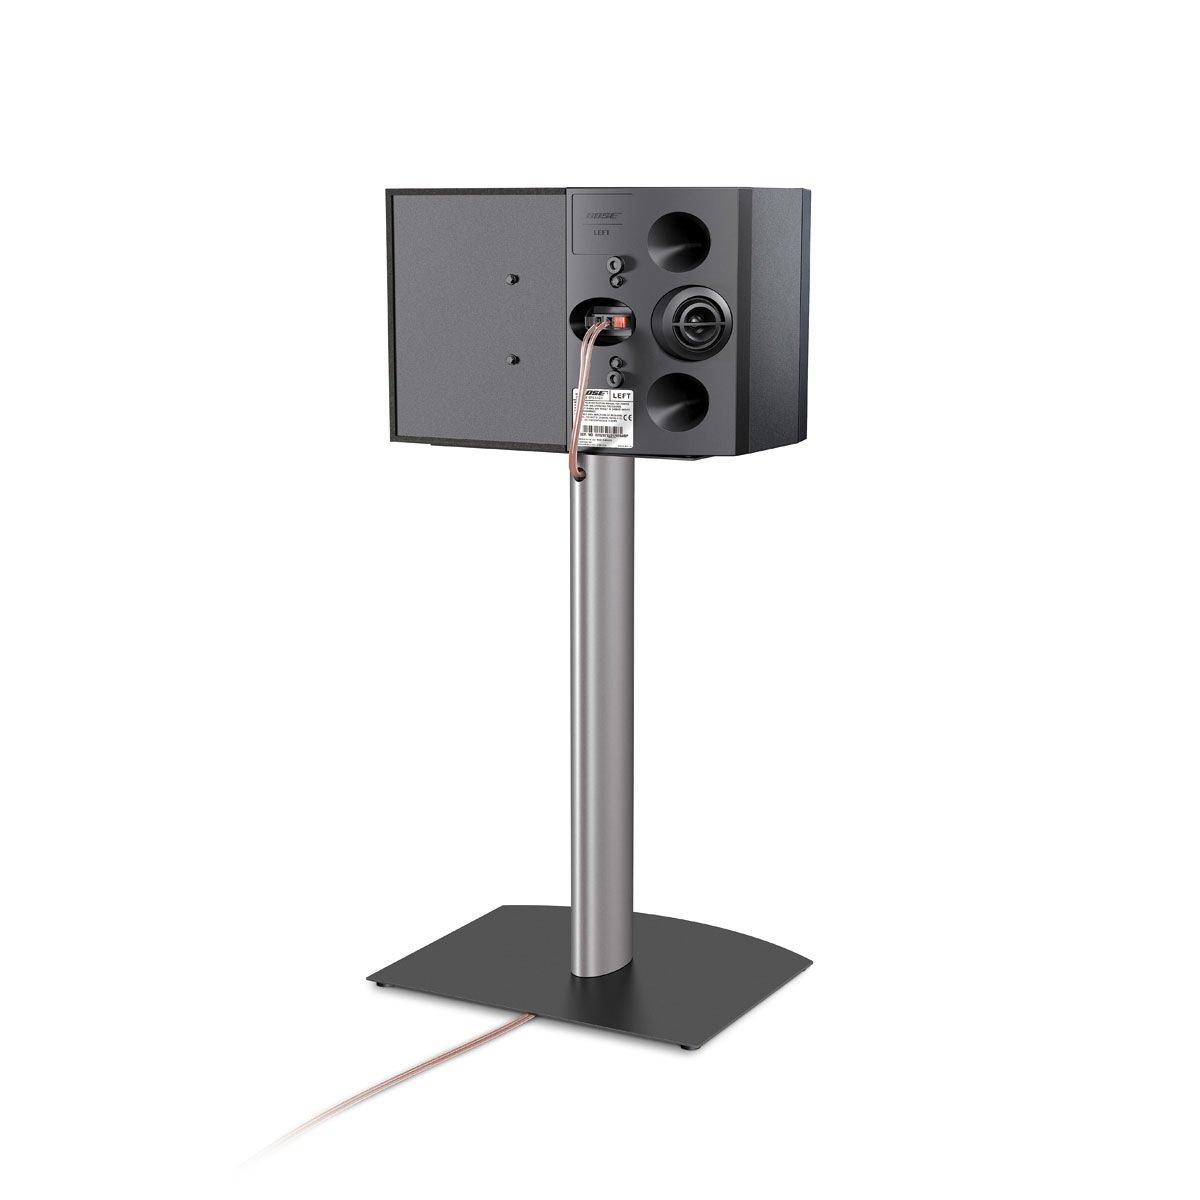 Bose 301-V Stereo Loudspeakers (Pair, Black) by Bose (Image #5)